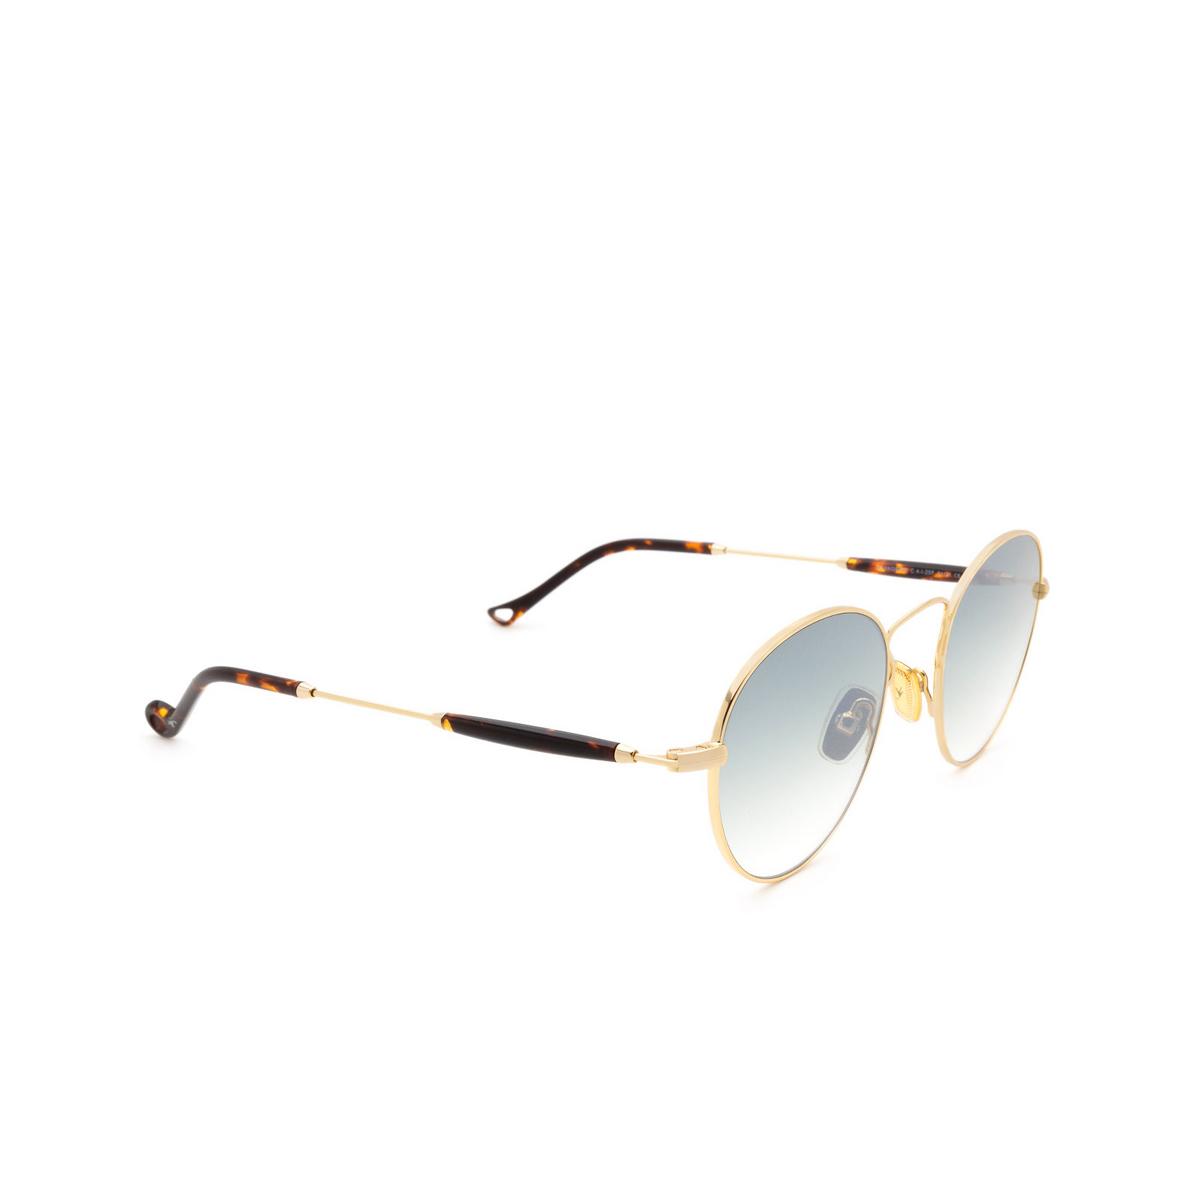 Eyepetizer® Round Sunglasses: Orangerie color Gold C.4-I-25F - three-quarters view.